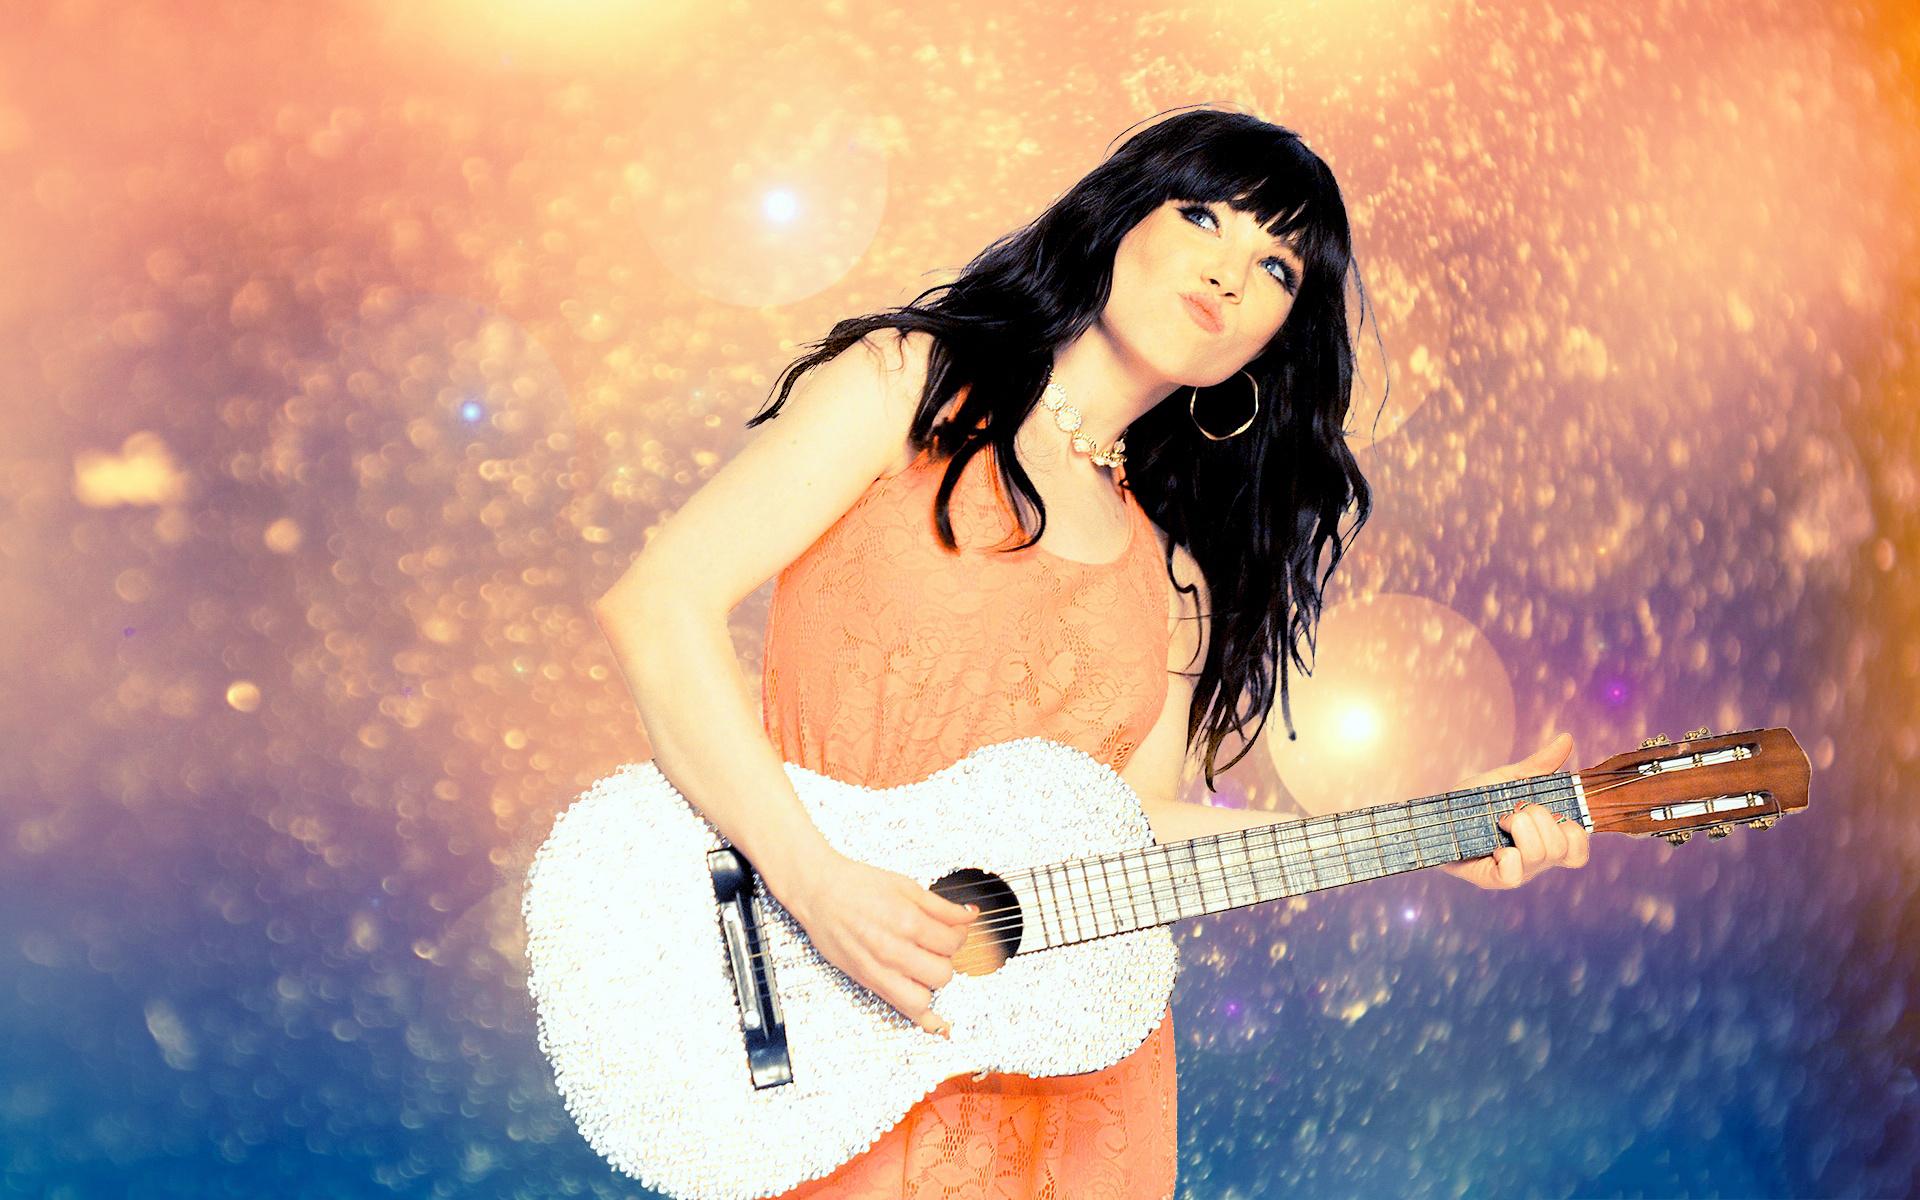 Carly rae jepsen guitar